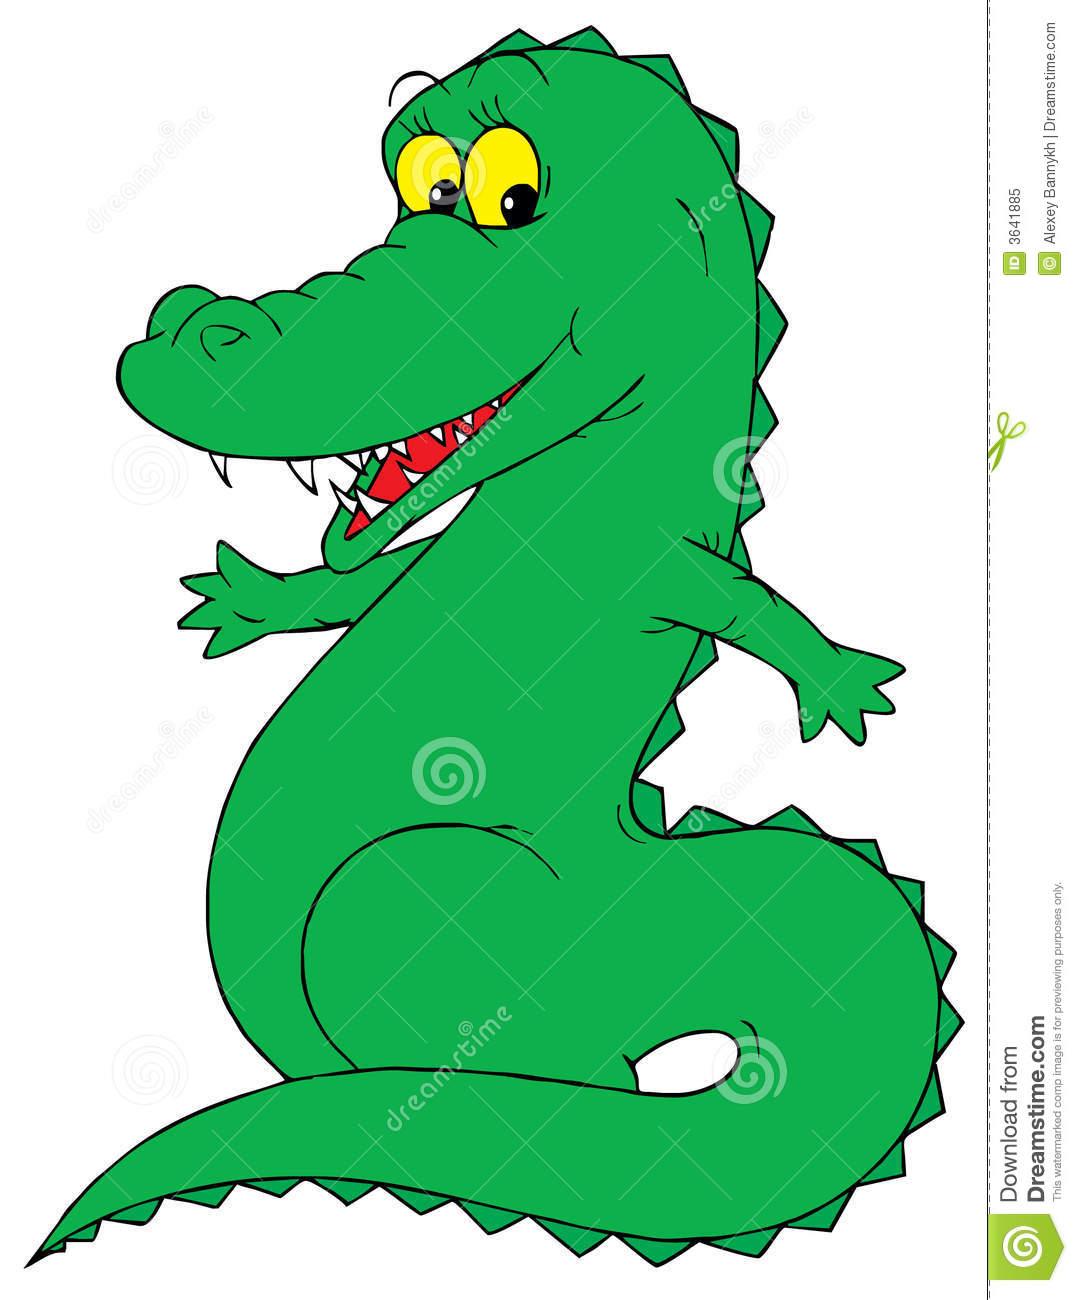 1077x1300 Top 75 Crocodile Clip Art